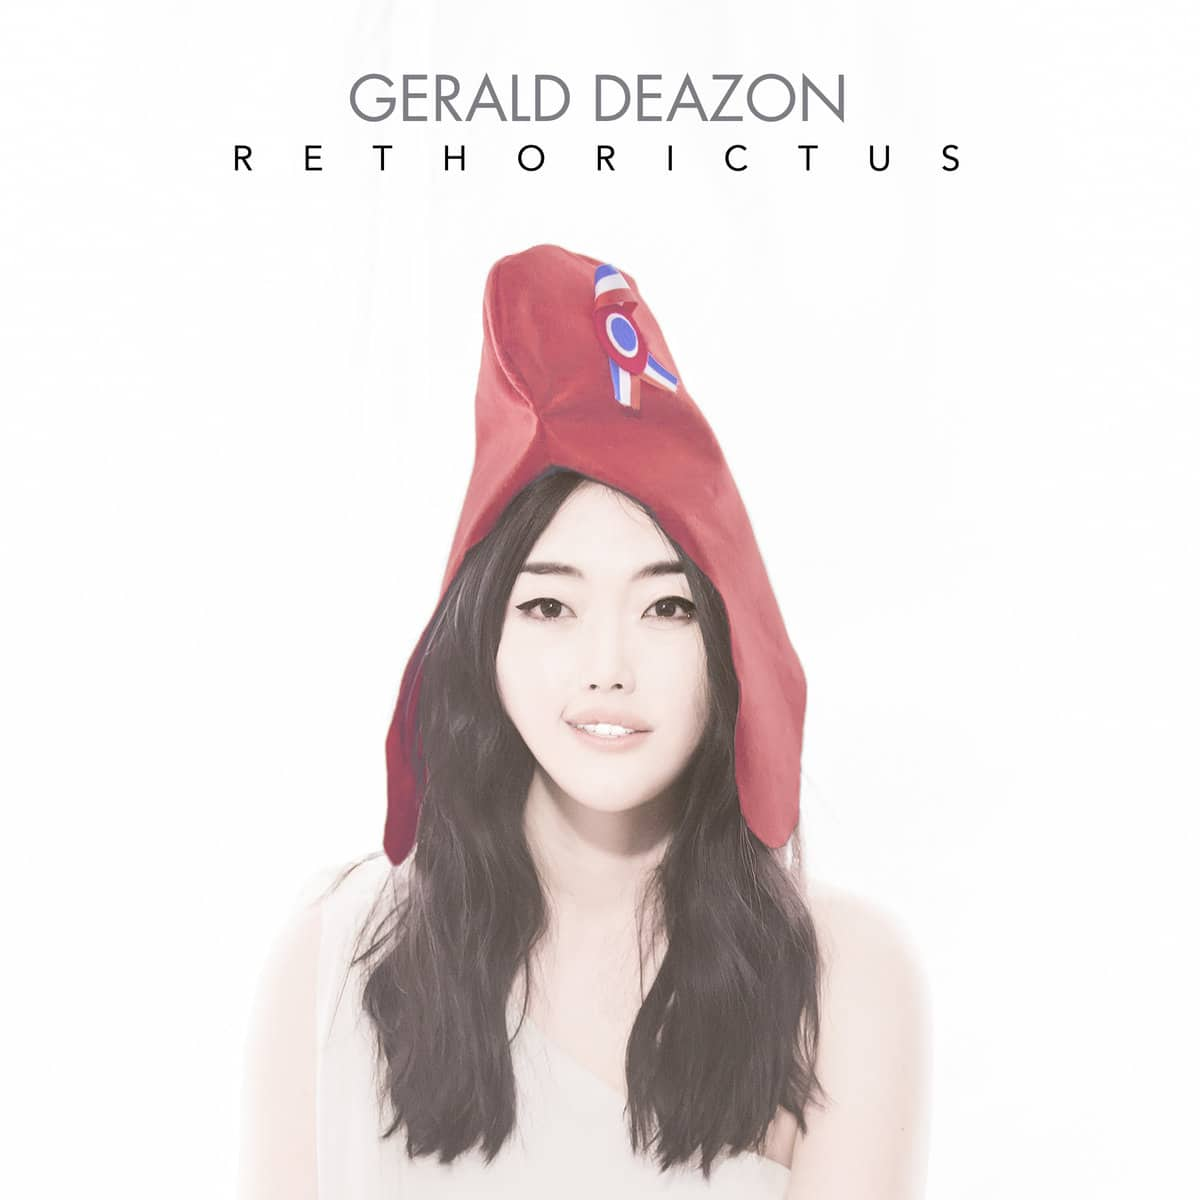 Cover album pochette gerald deazon rethorictus